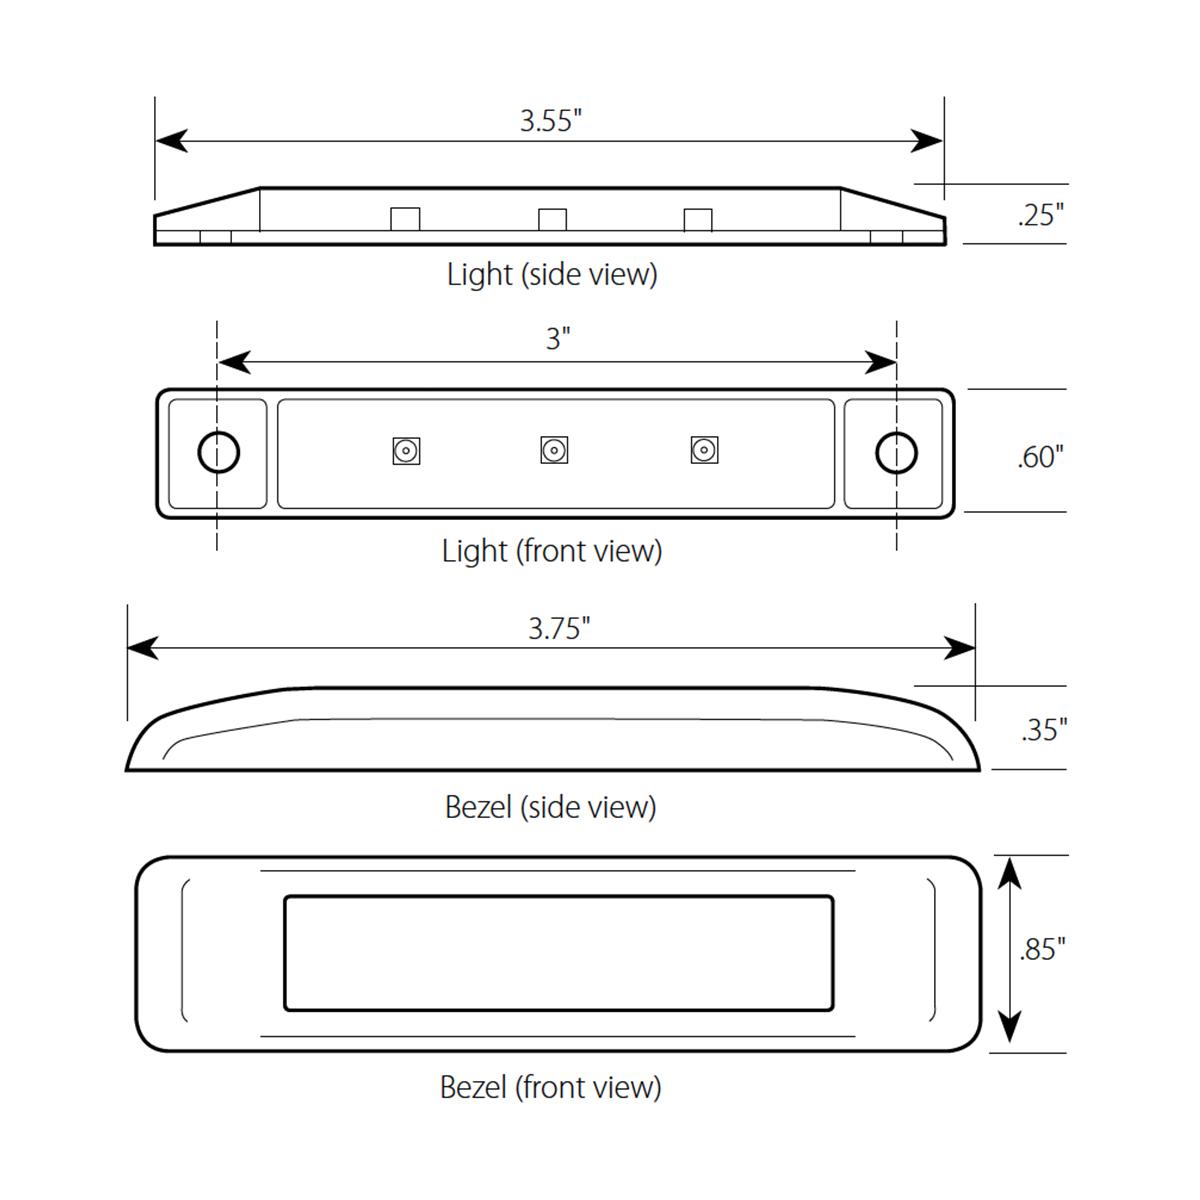 "3.5"" Ultra Thin LED Marker Light"